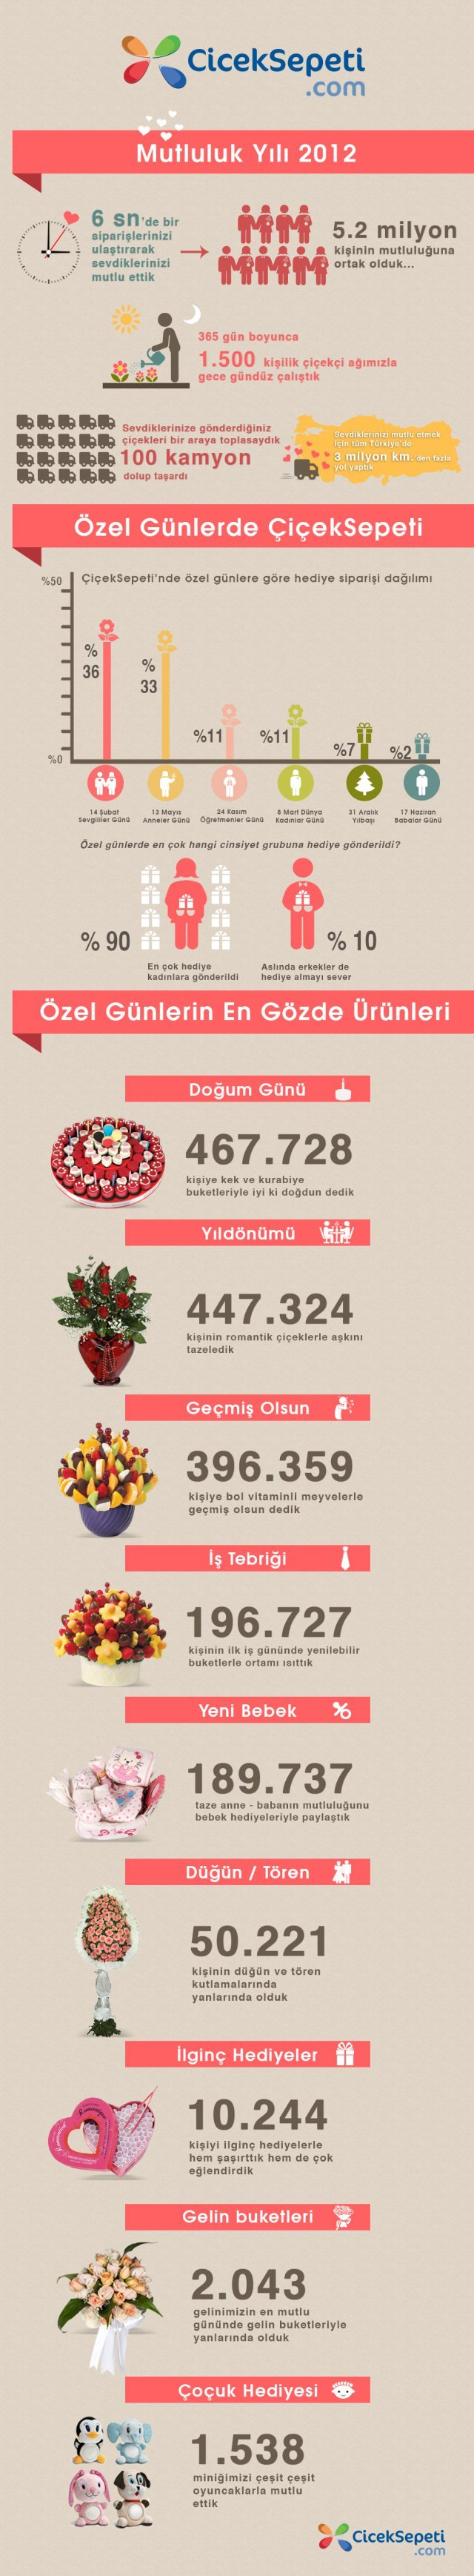 ciceksepeti infografik